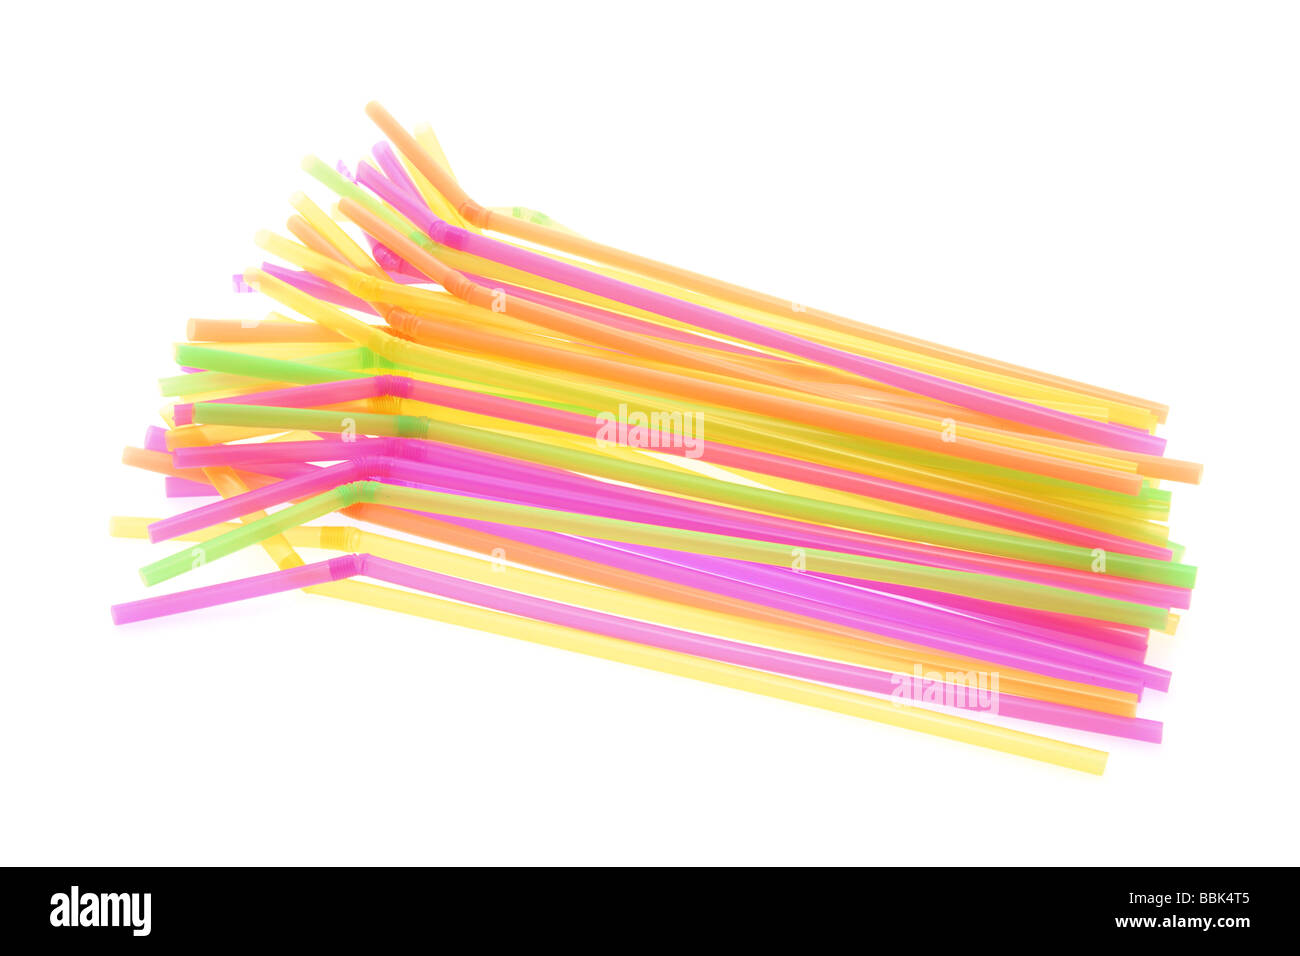 Plastic Drinking Straws - Stock Image